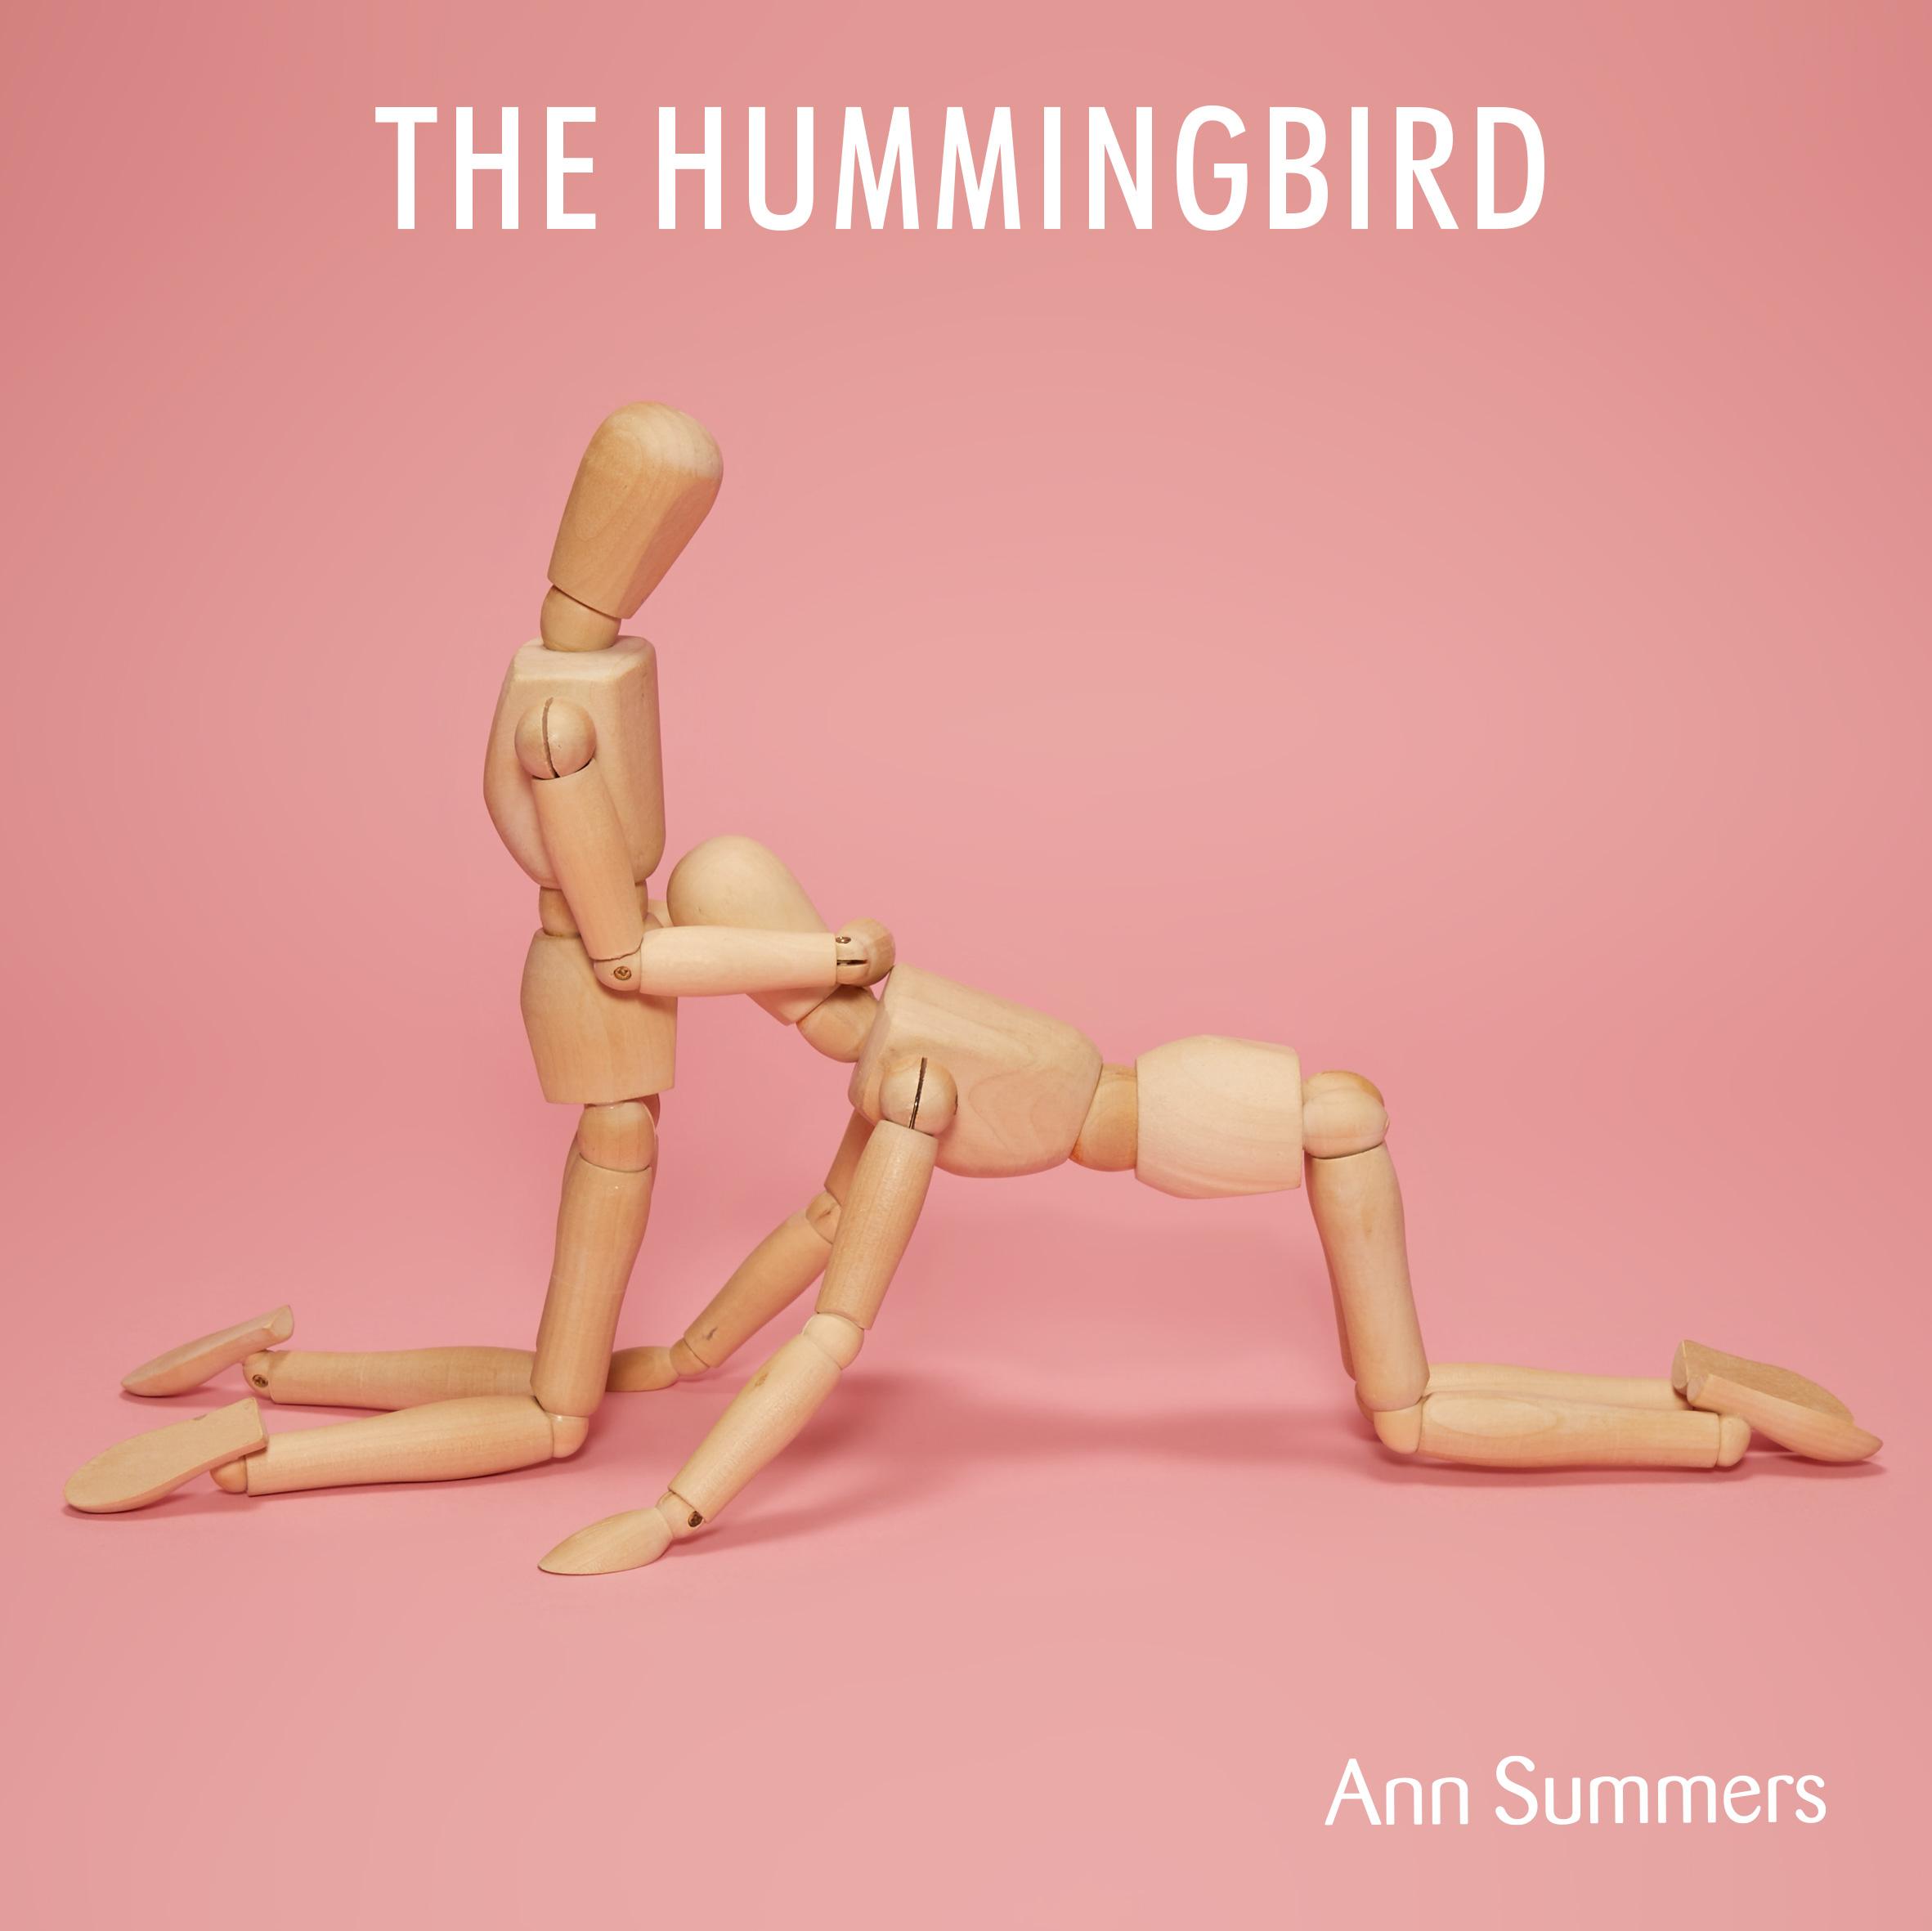 The Hummingbird Sex Position